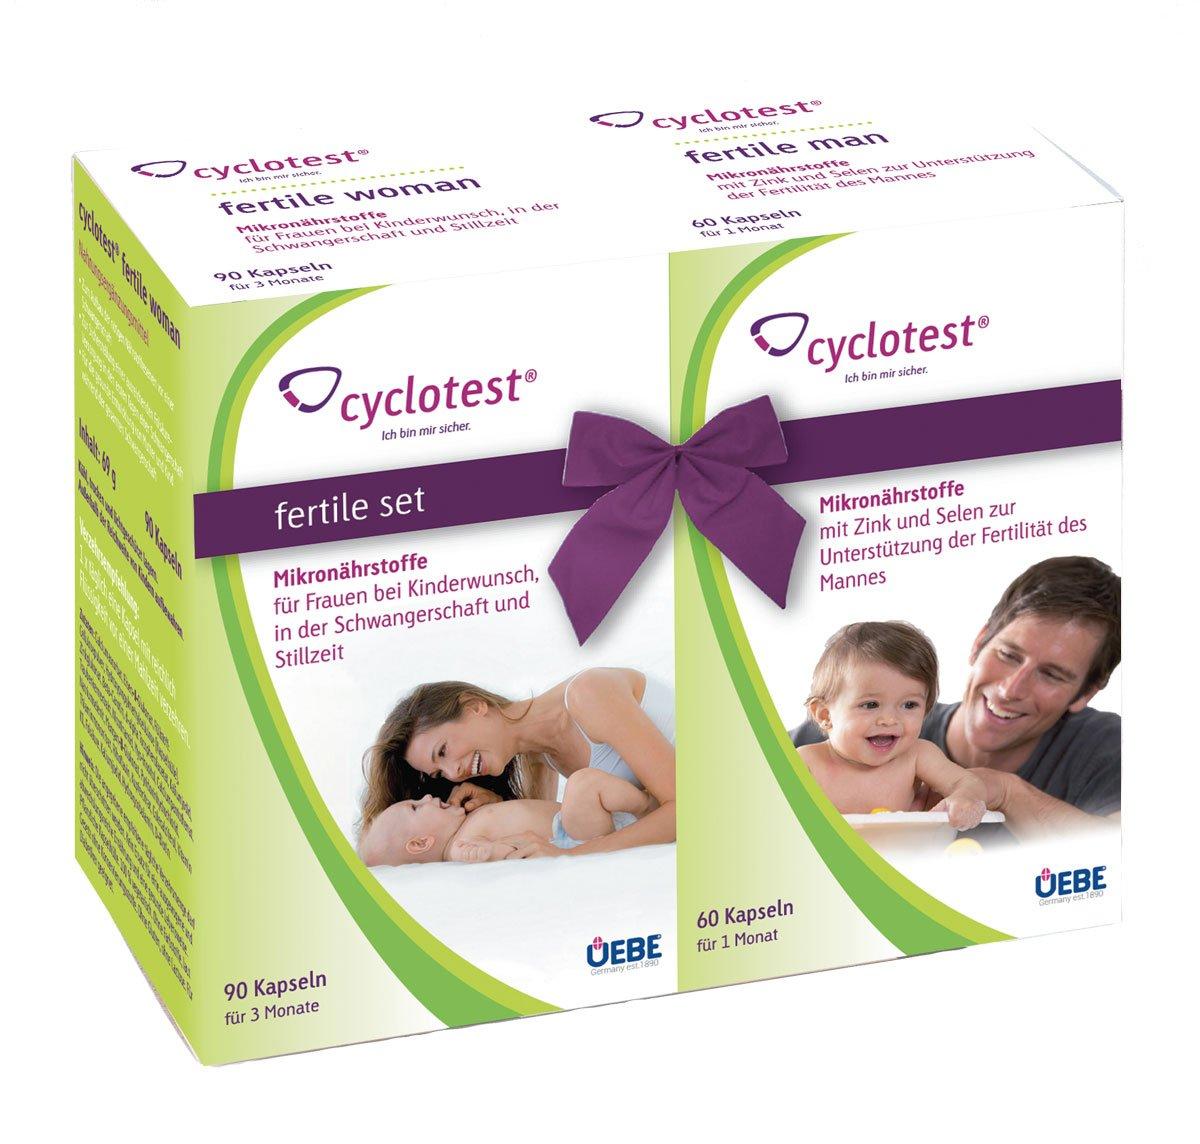 Cyclotest fertile Set für Frau und Mann